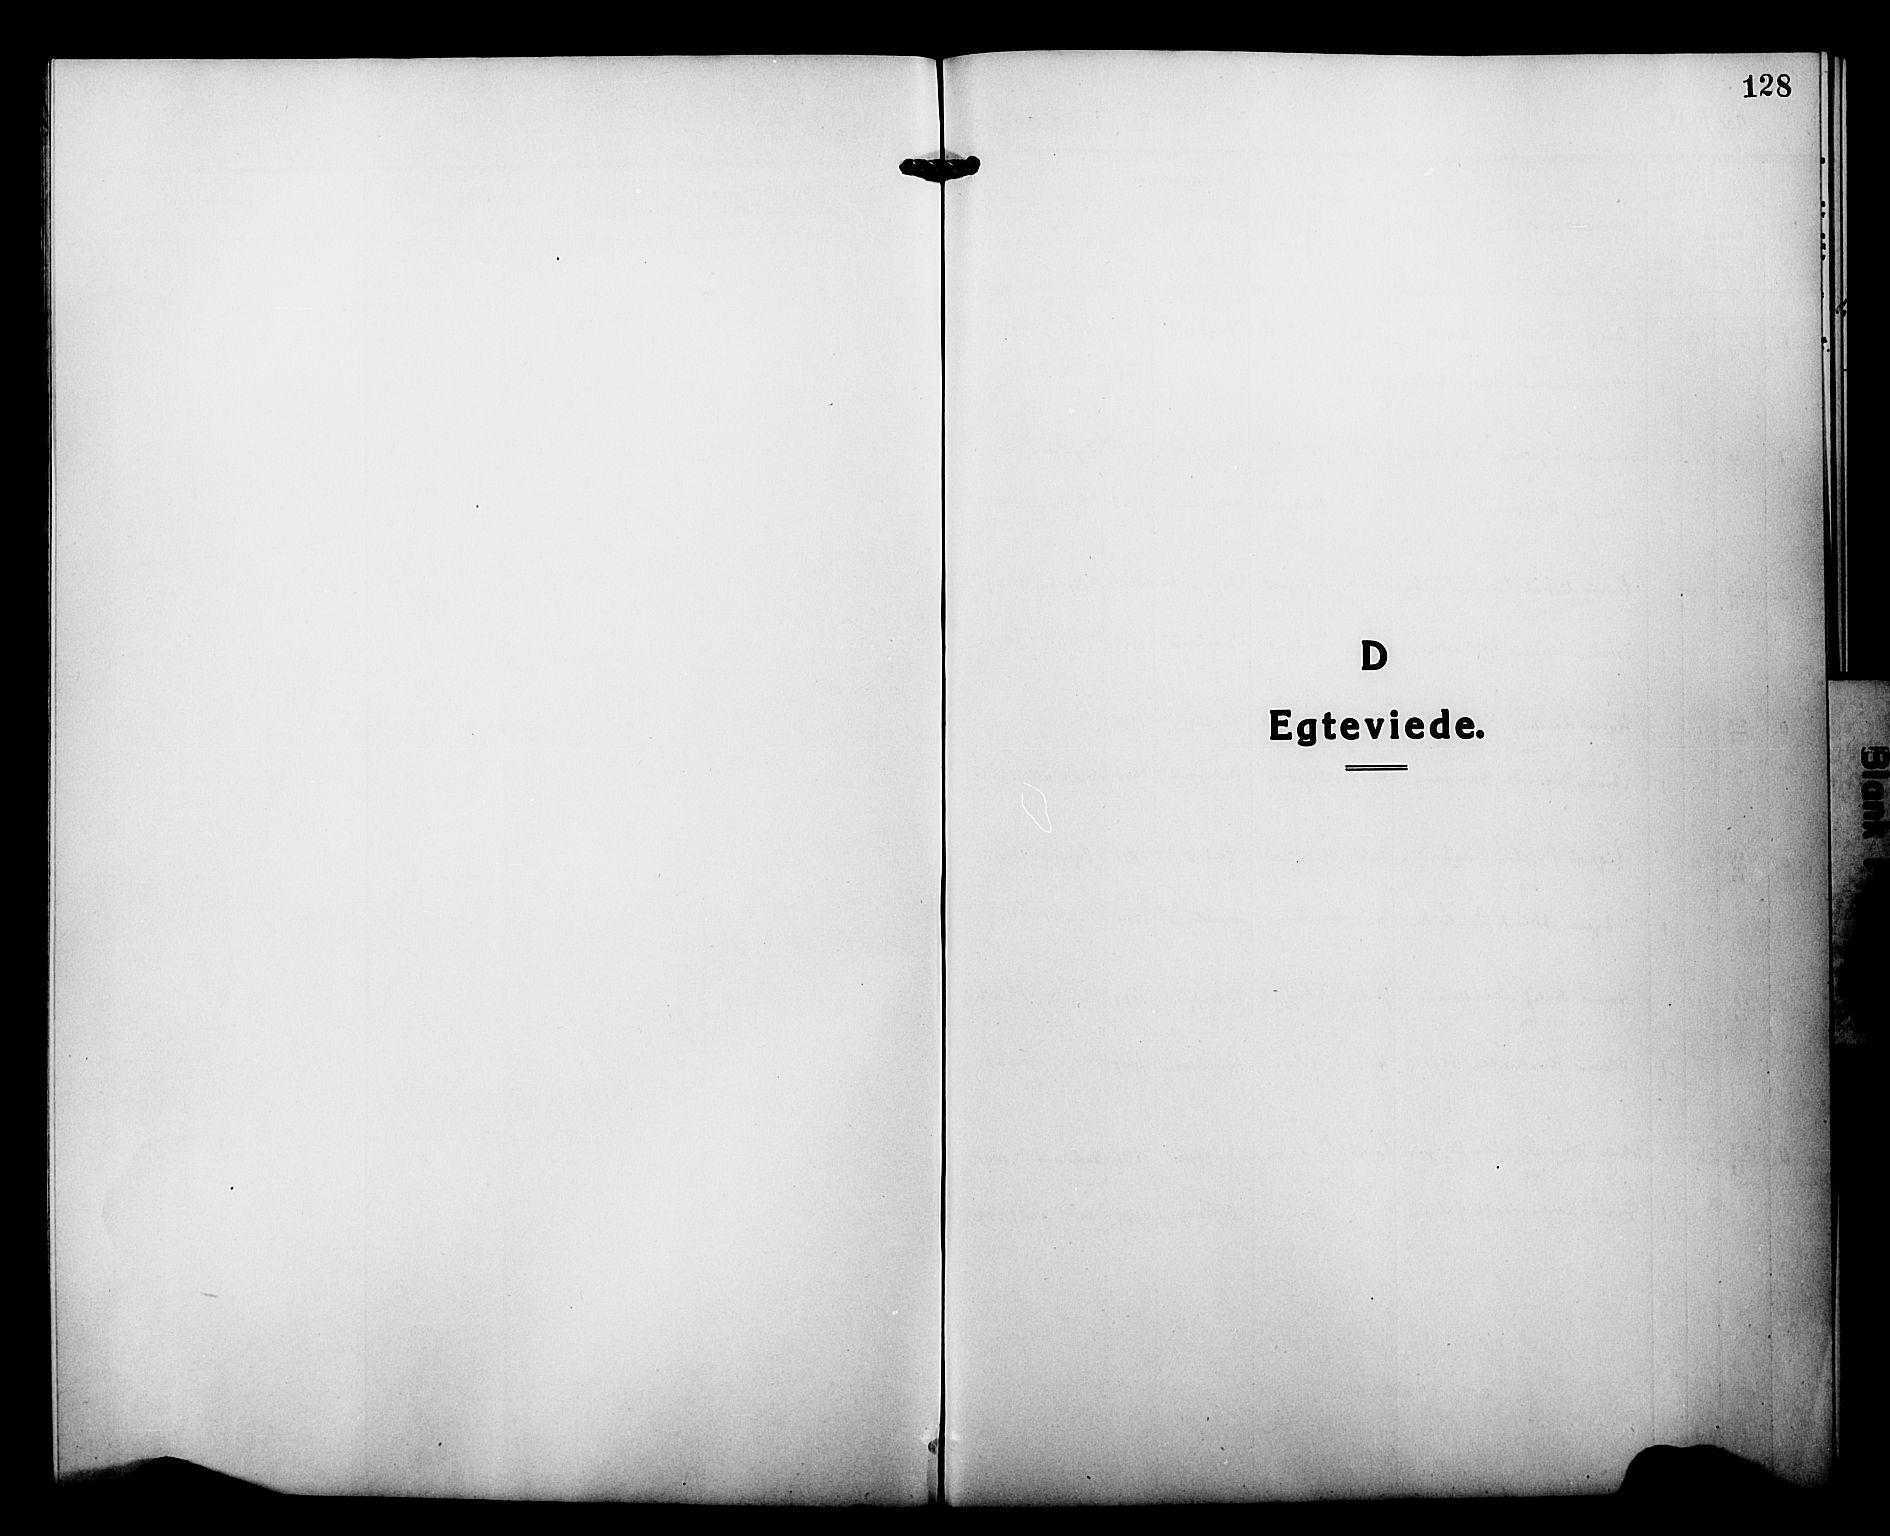 SATØ, Tranøy sokneprestkontor, I/Ia/Iab/L0015klokker: Klokkerbok nr. 15, 1918-1930, s. 128